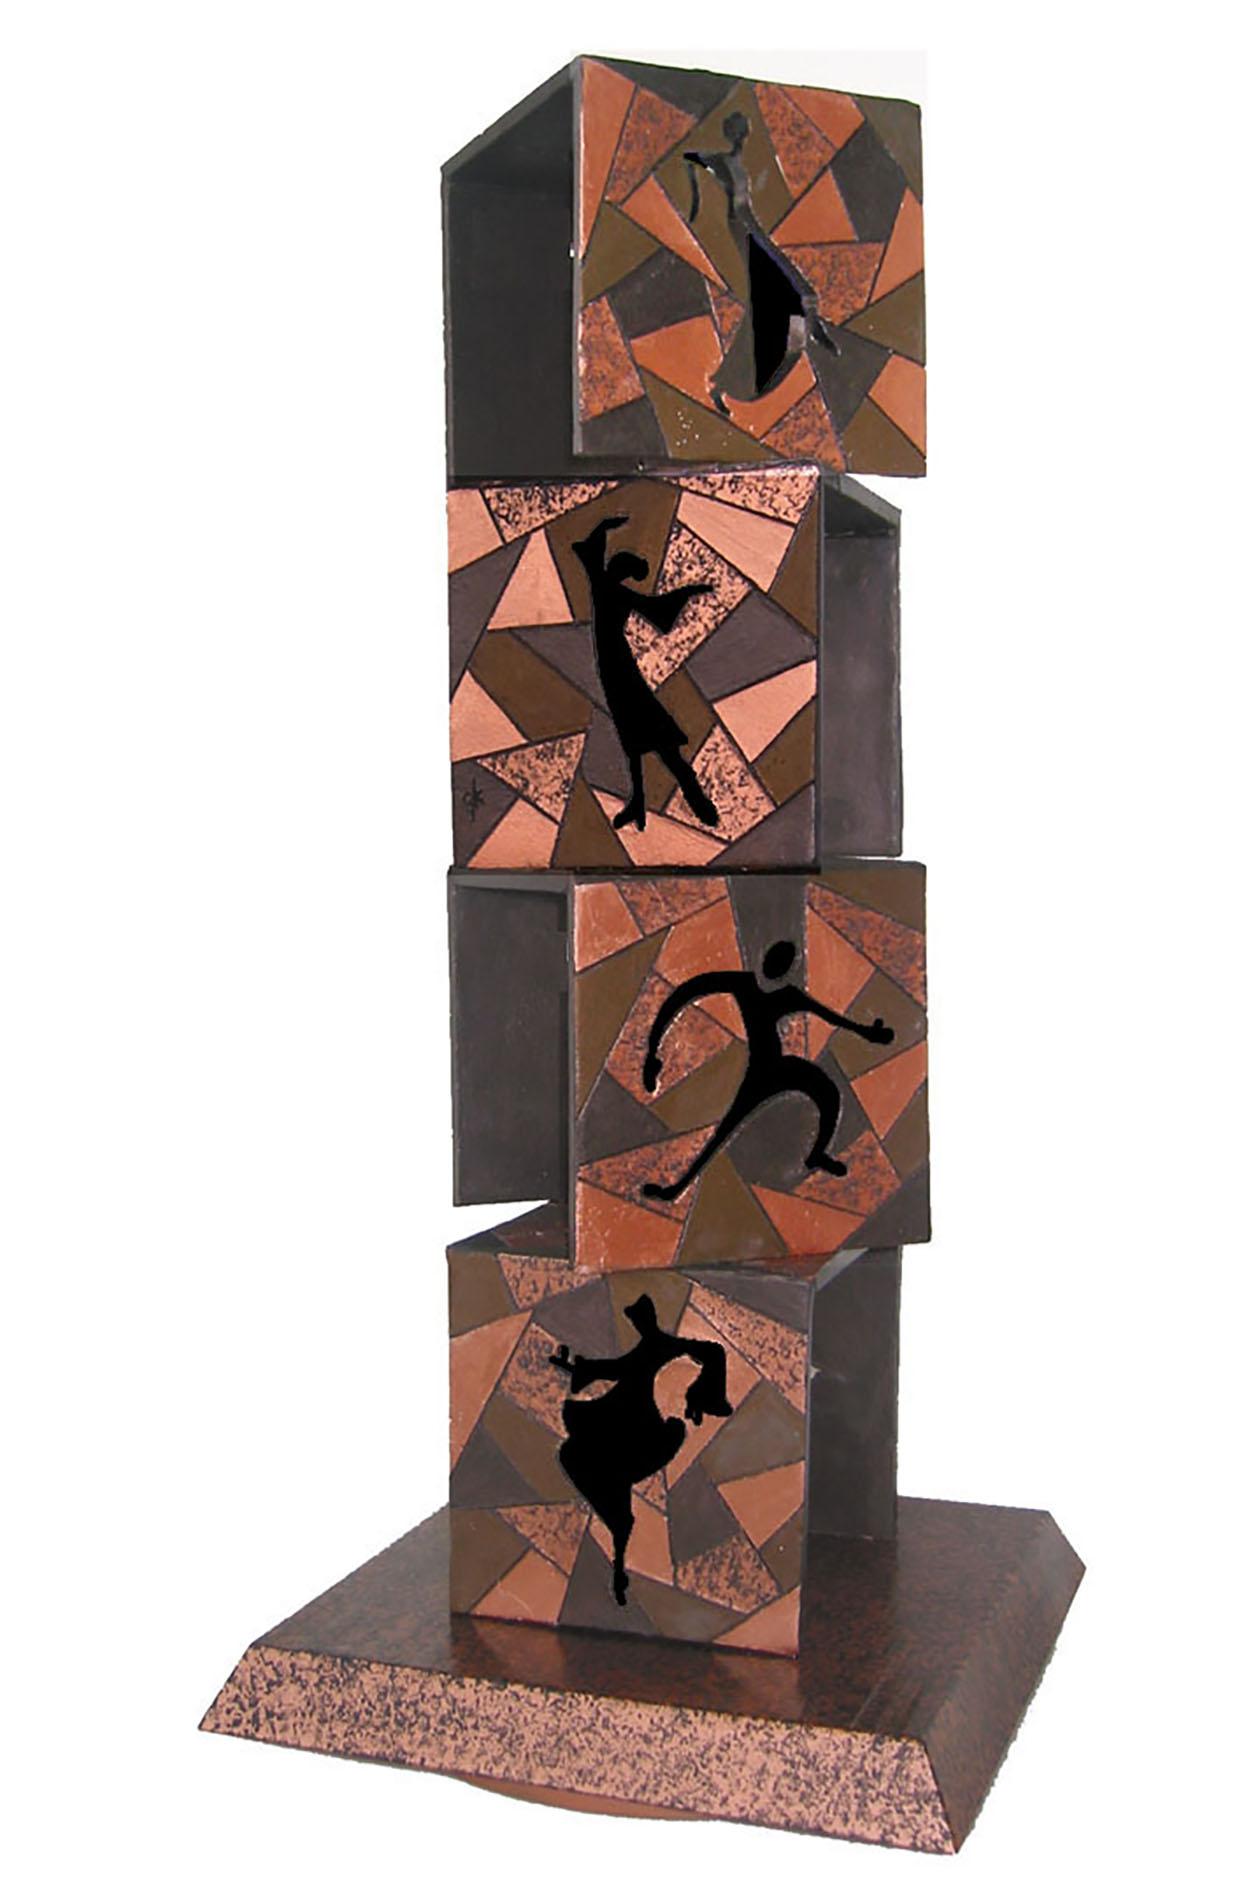 Fantasy Card Tower.jpg